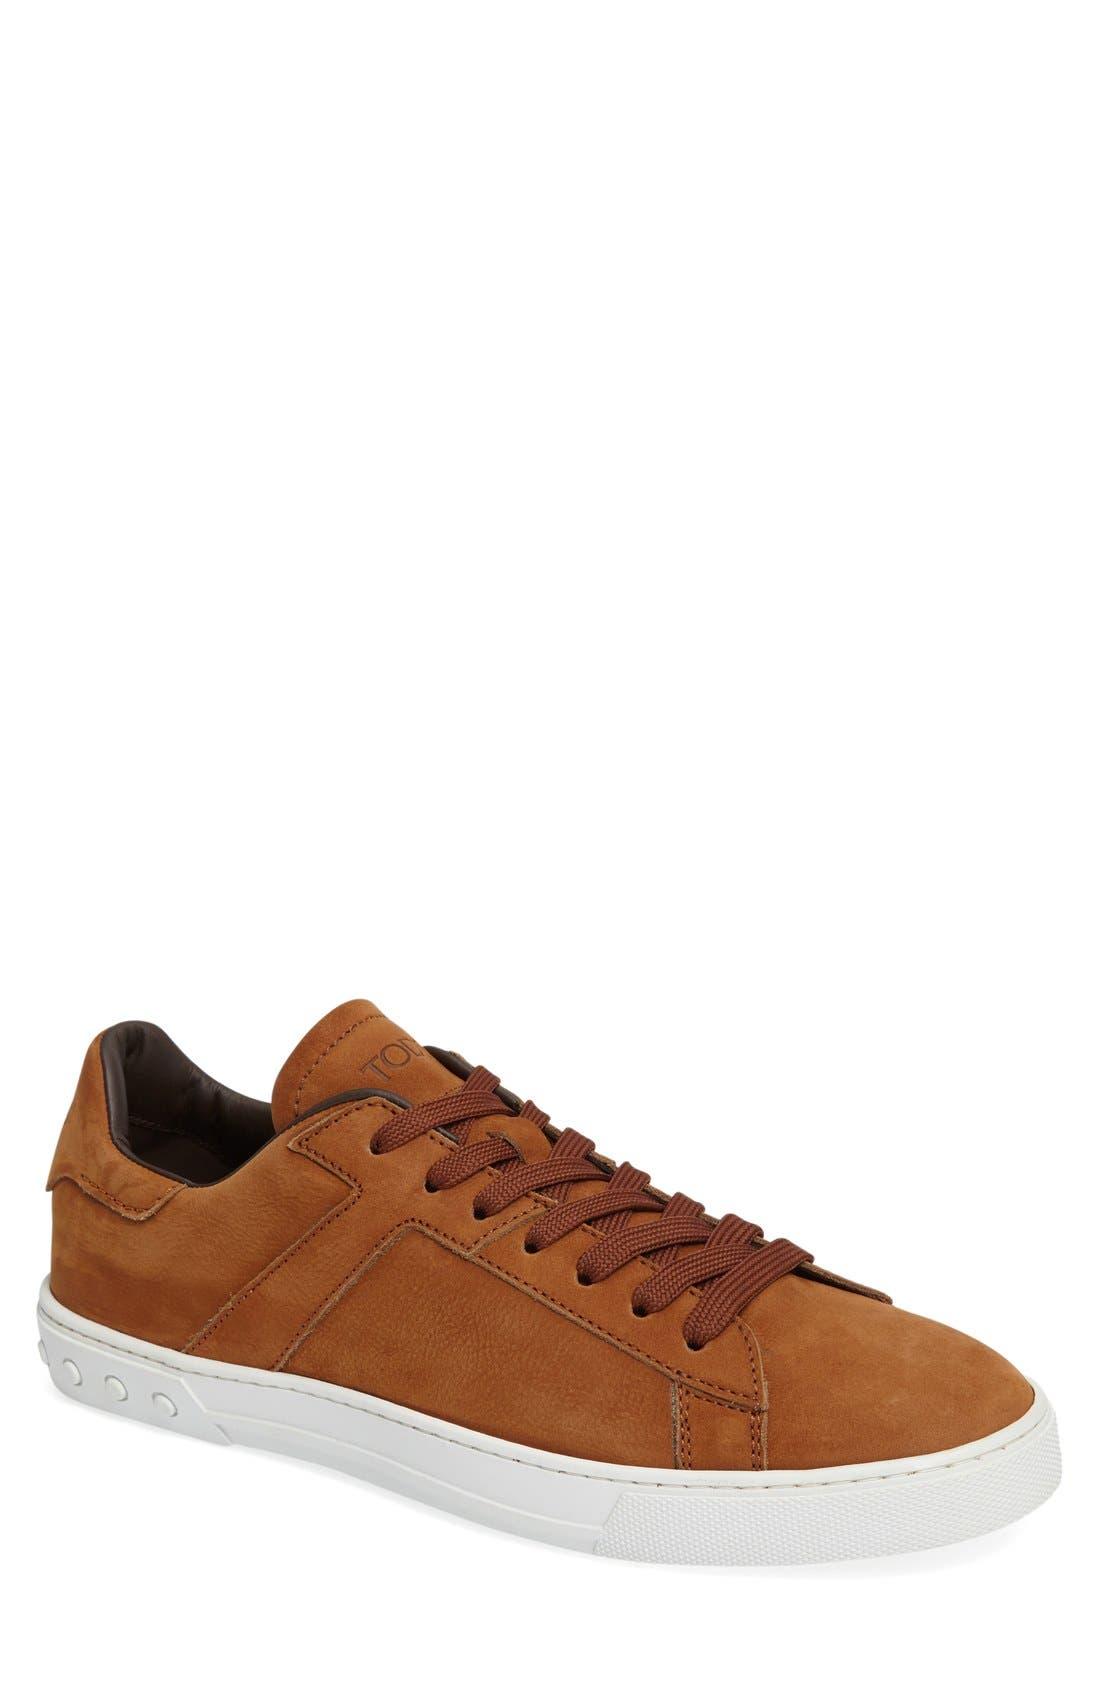 Cassetta Sneaker, Main, color, 200